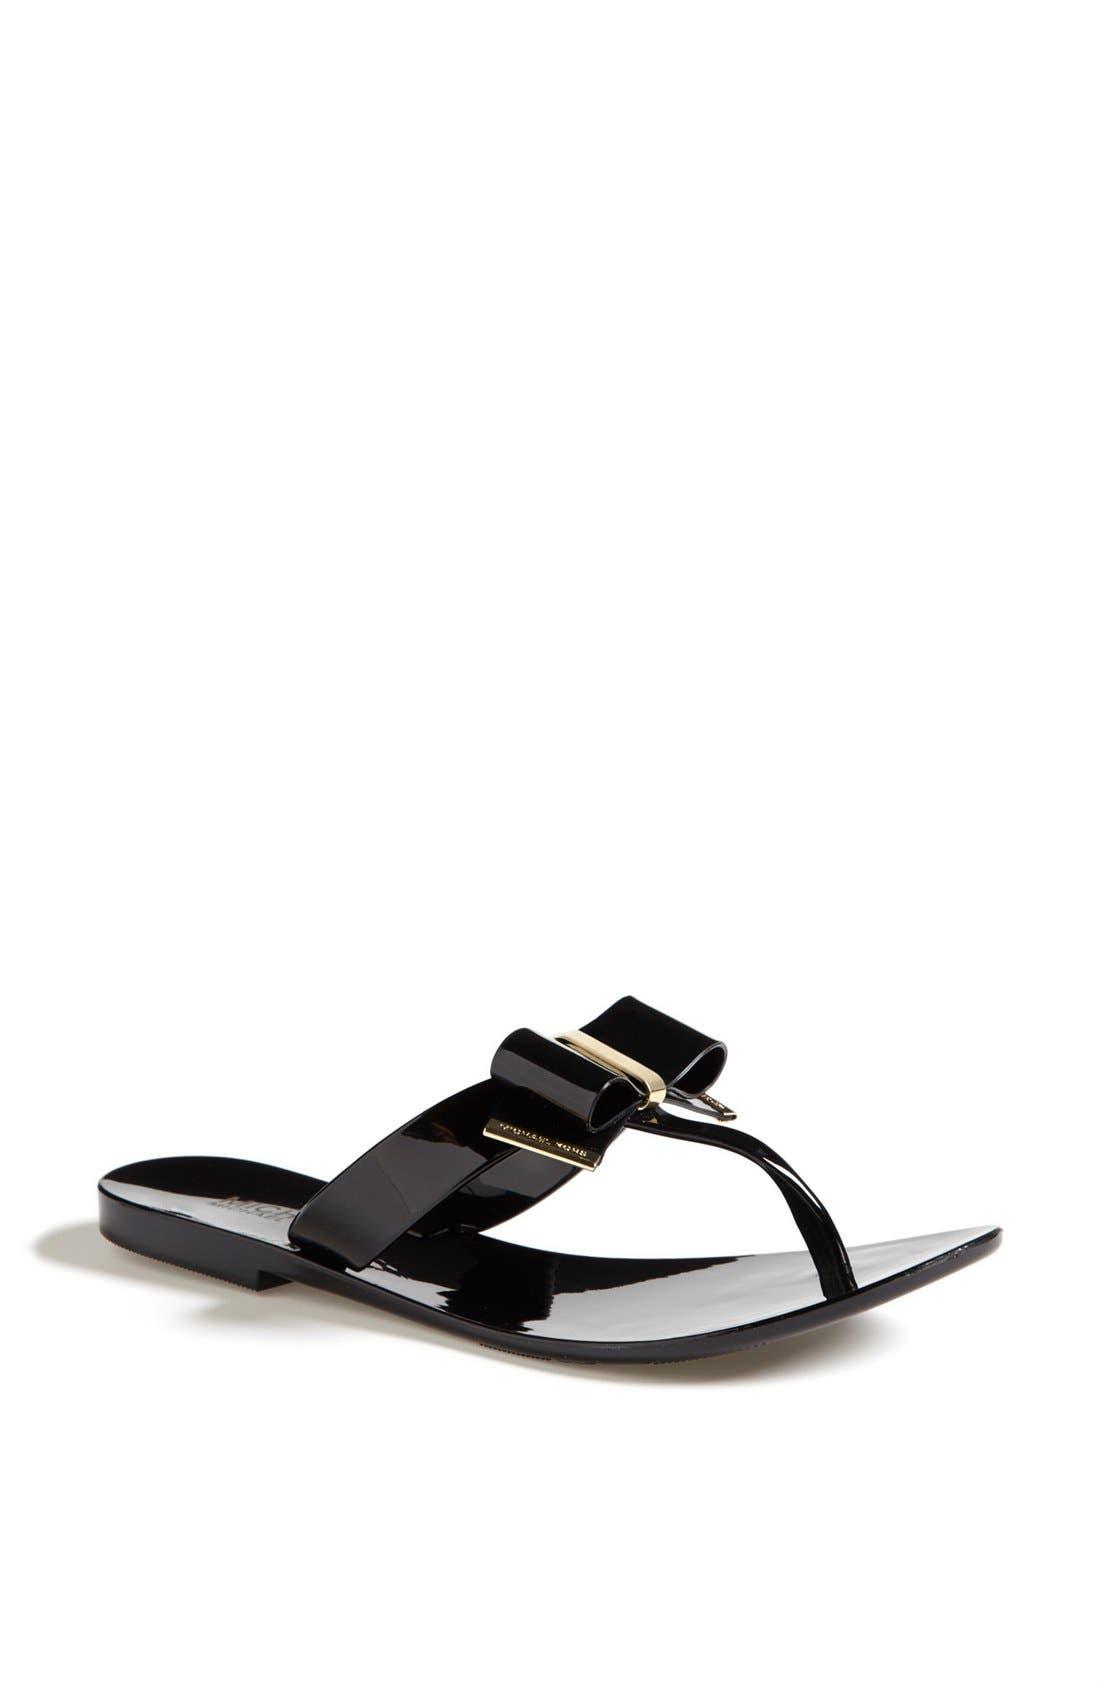 Main Image - MICHAEL Michael Kors 'Kayden' Sandal